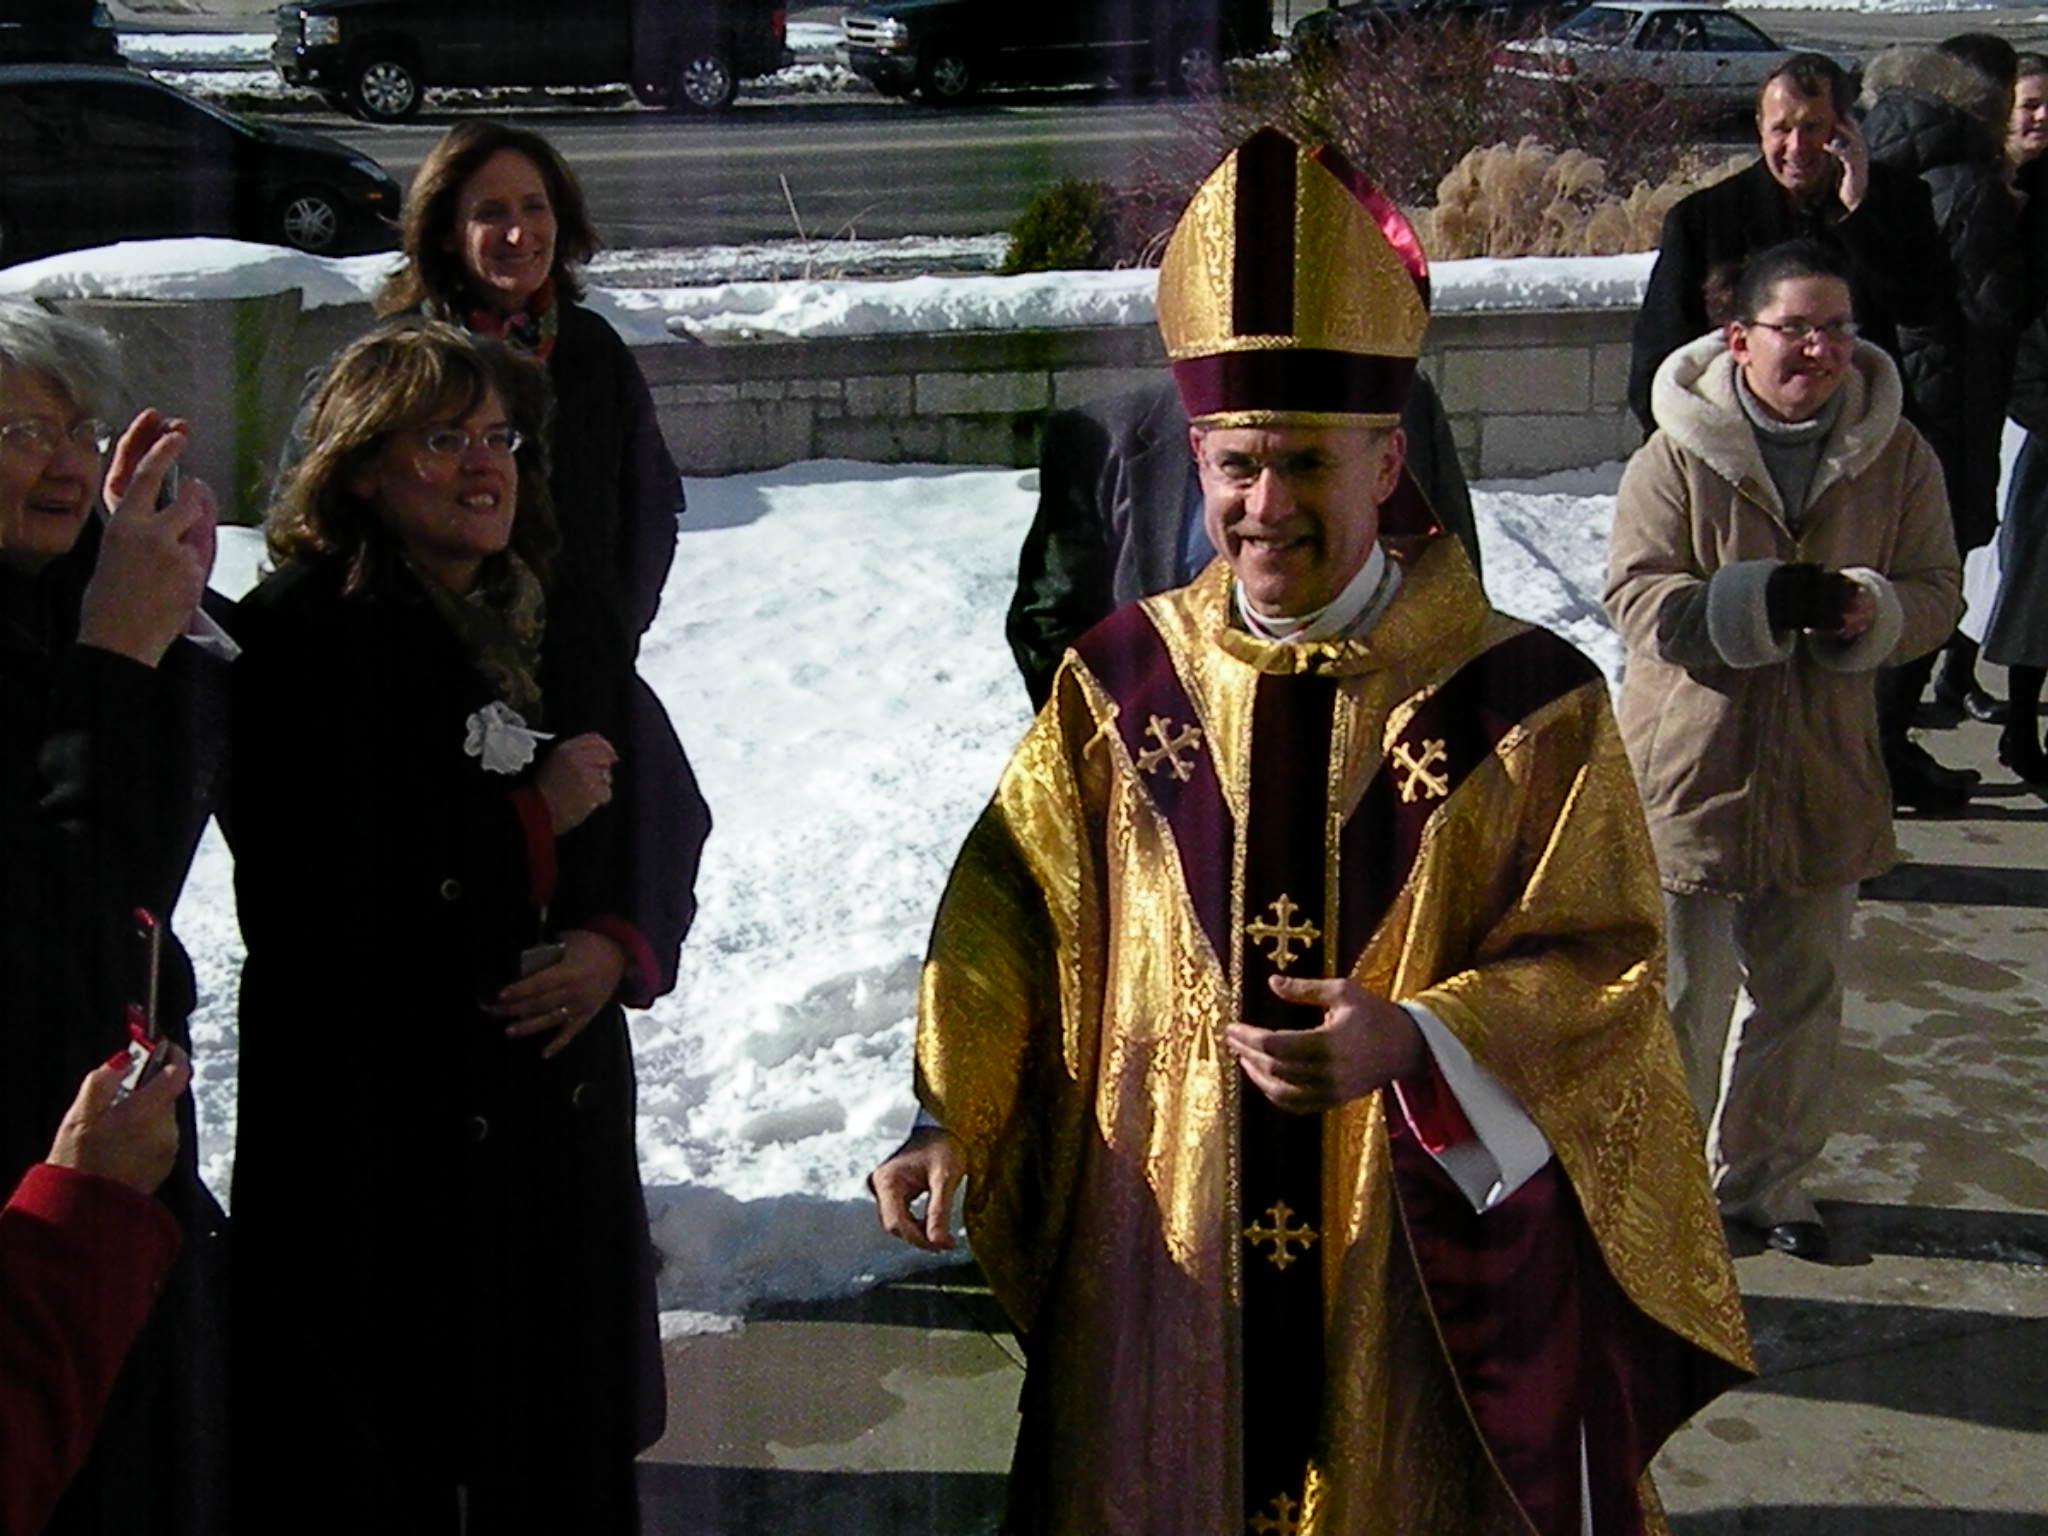 Bishop kevin c rhoades installed todays catholic dscn3380 kristyandbryce Image collections